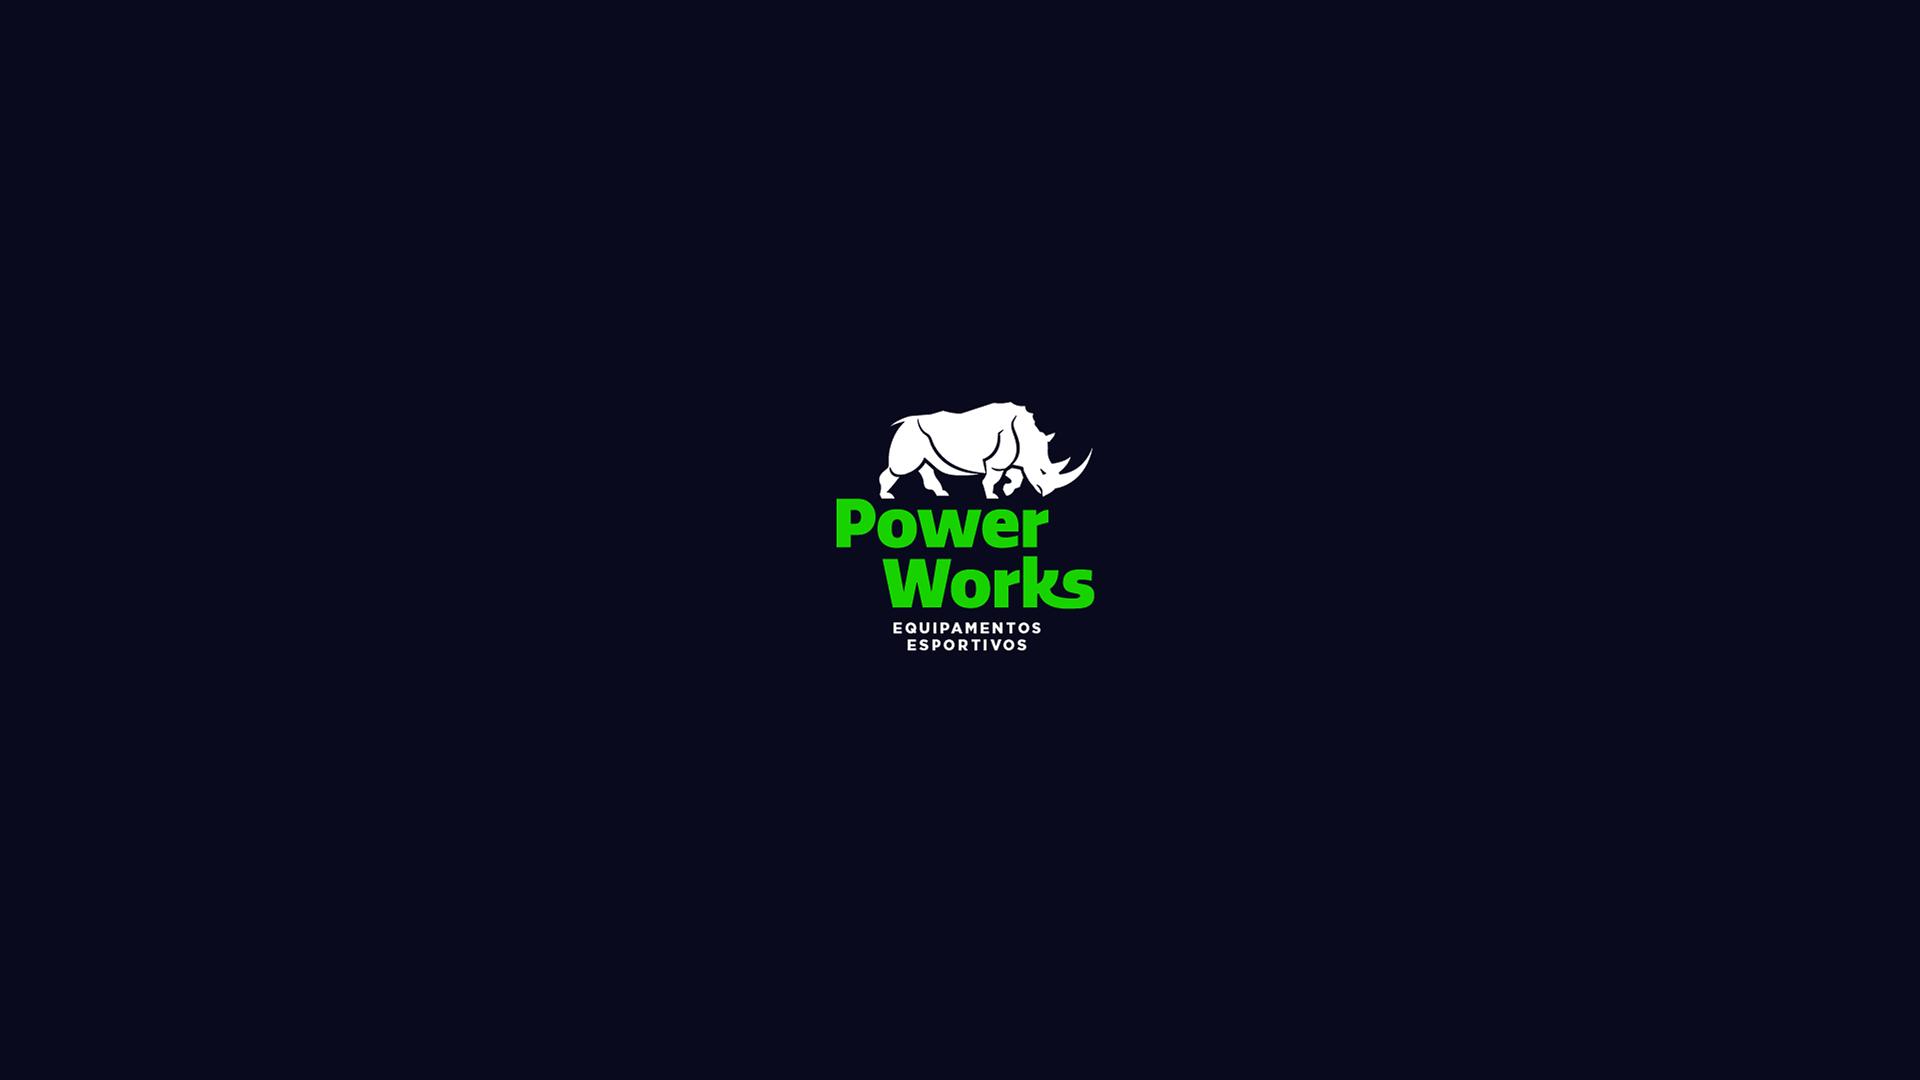 rhino power works crossfit logo